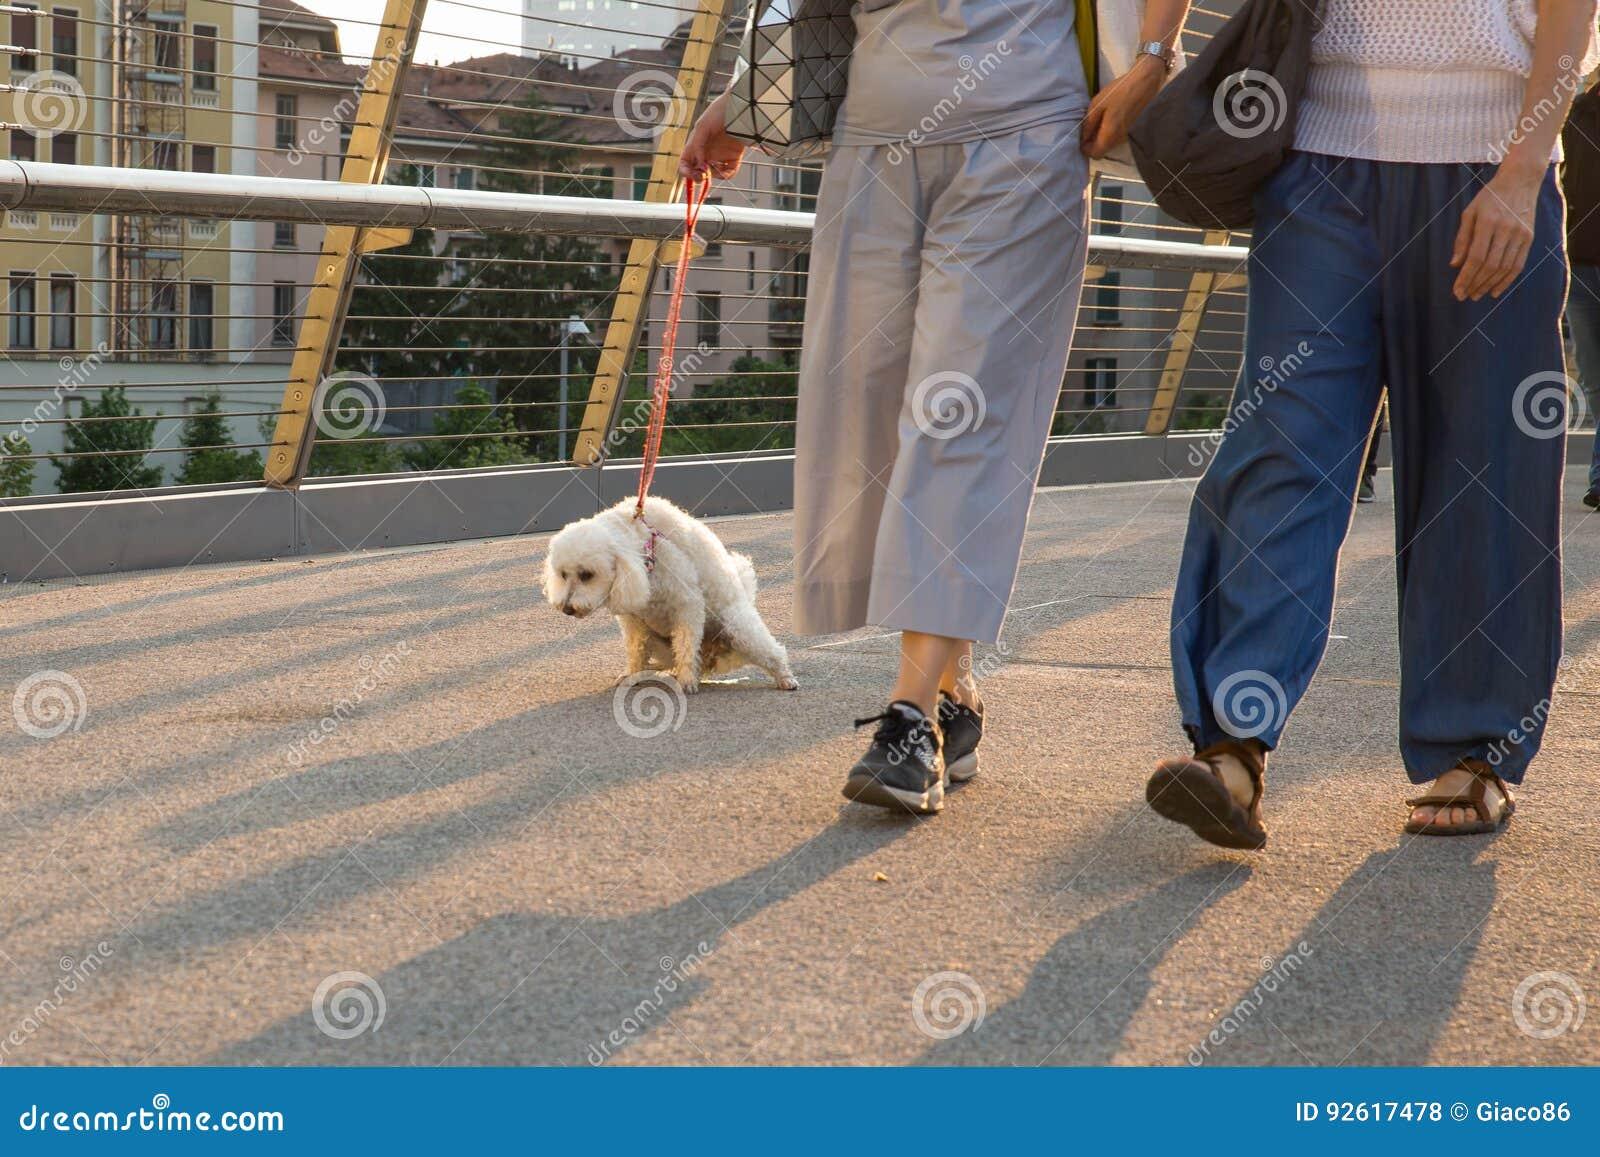 Take the dog to pee - poodle pee on a urban bridge